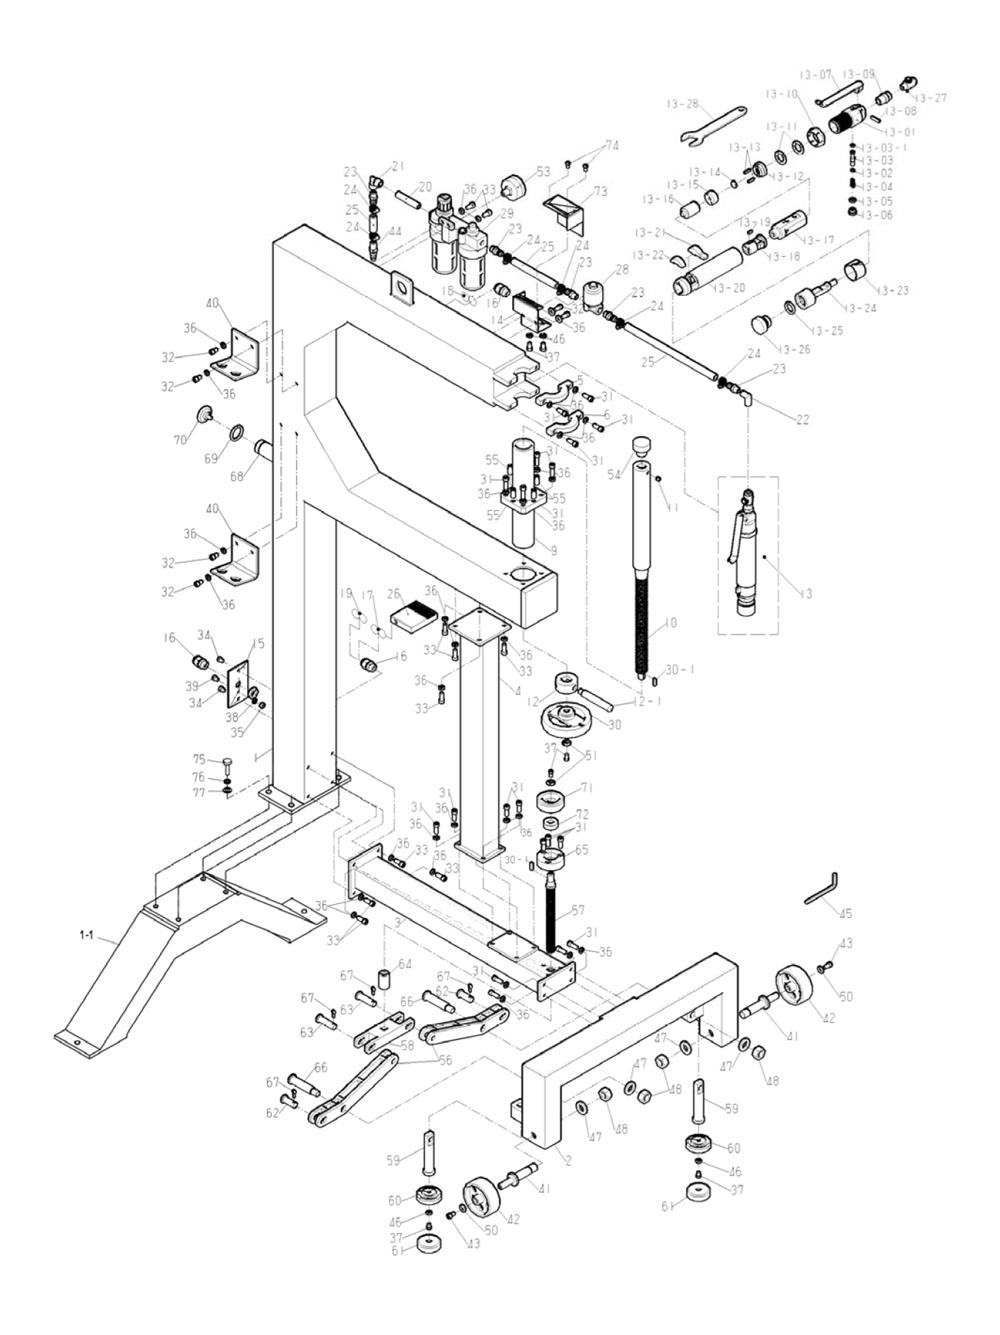 Buy Jet 756121 PH-24T 24 Inch Planishing Hammer